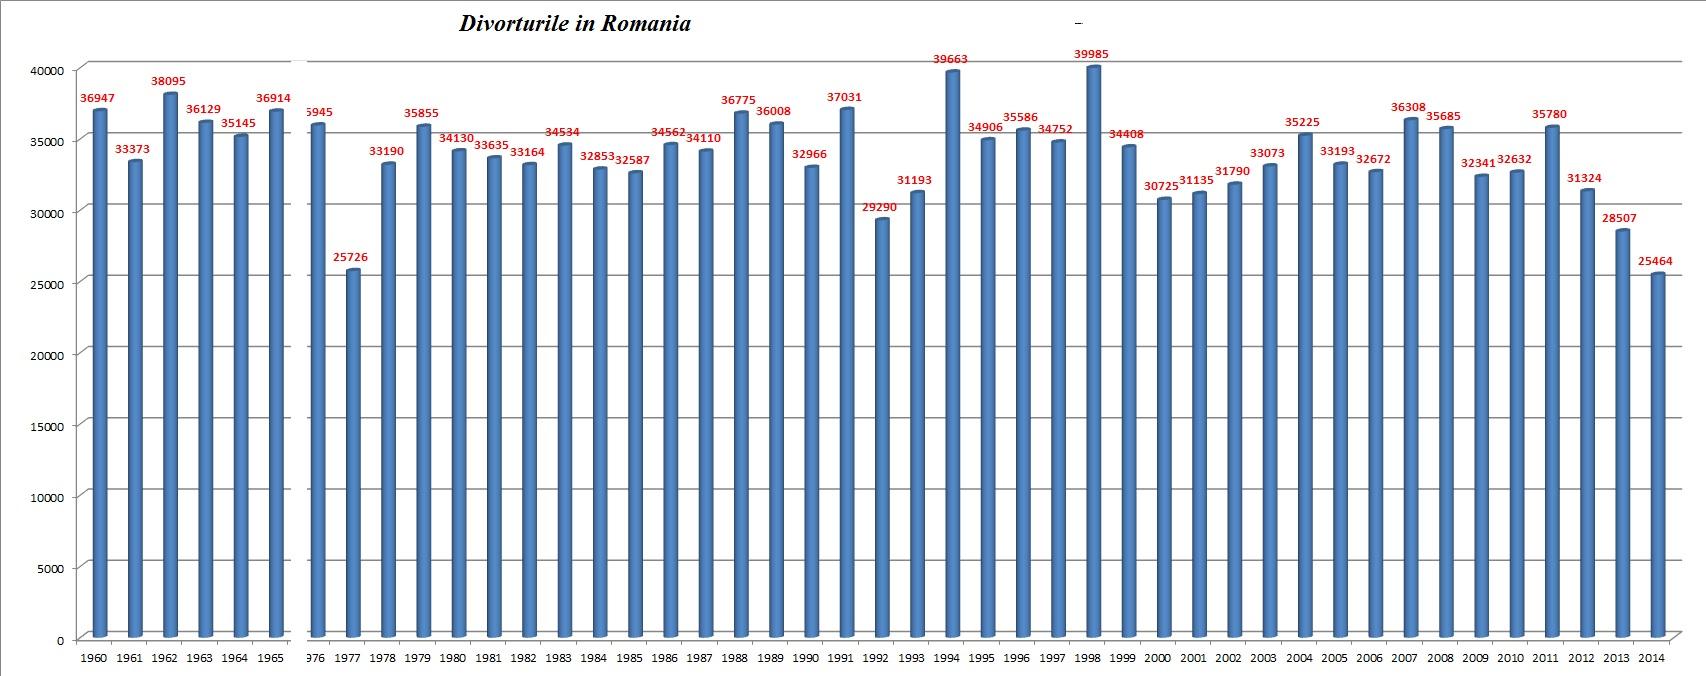 Divorturi Romania